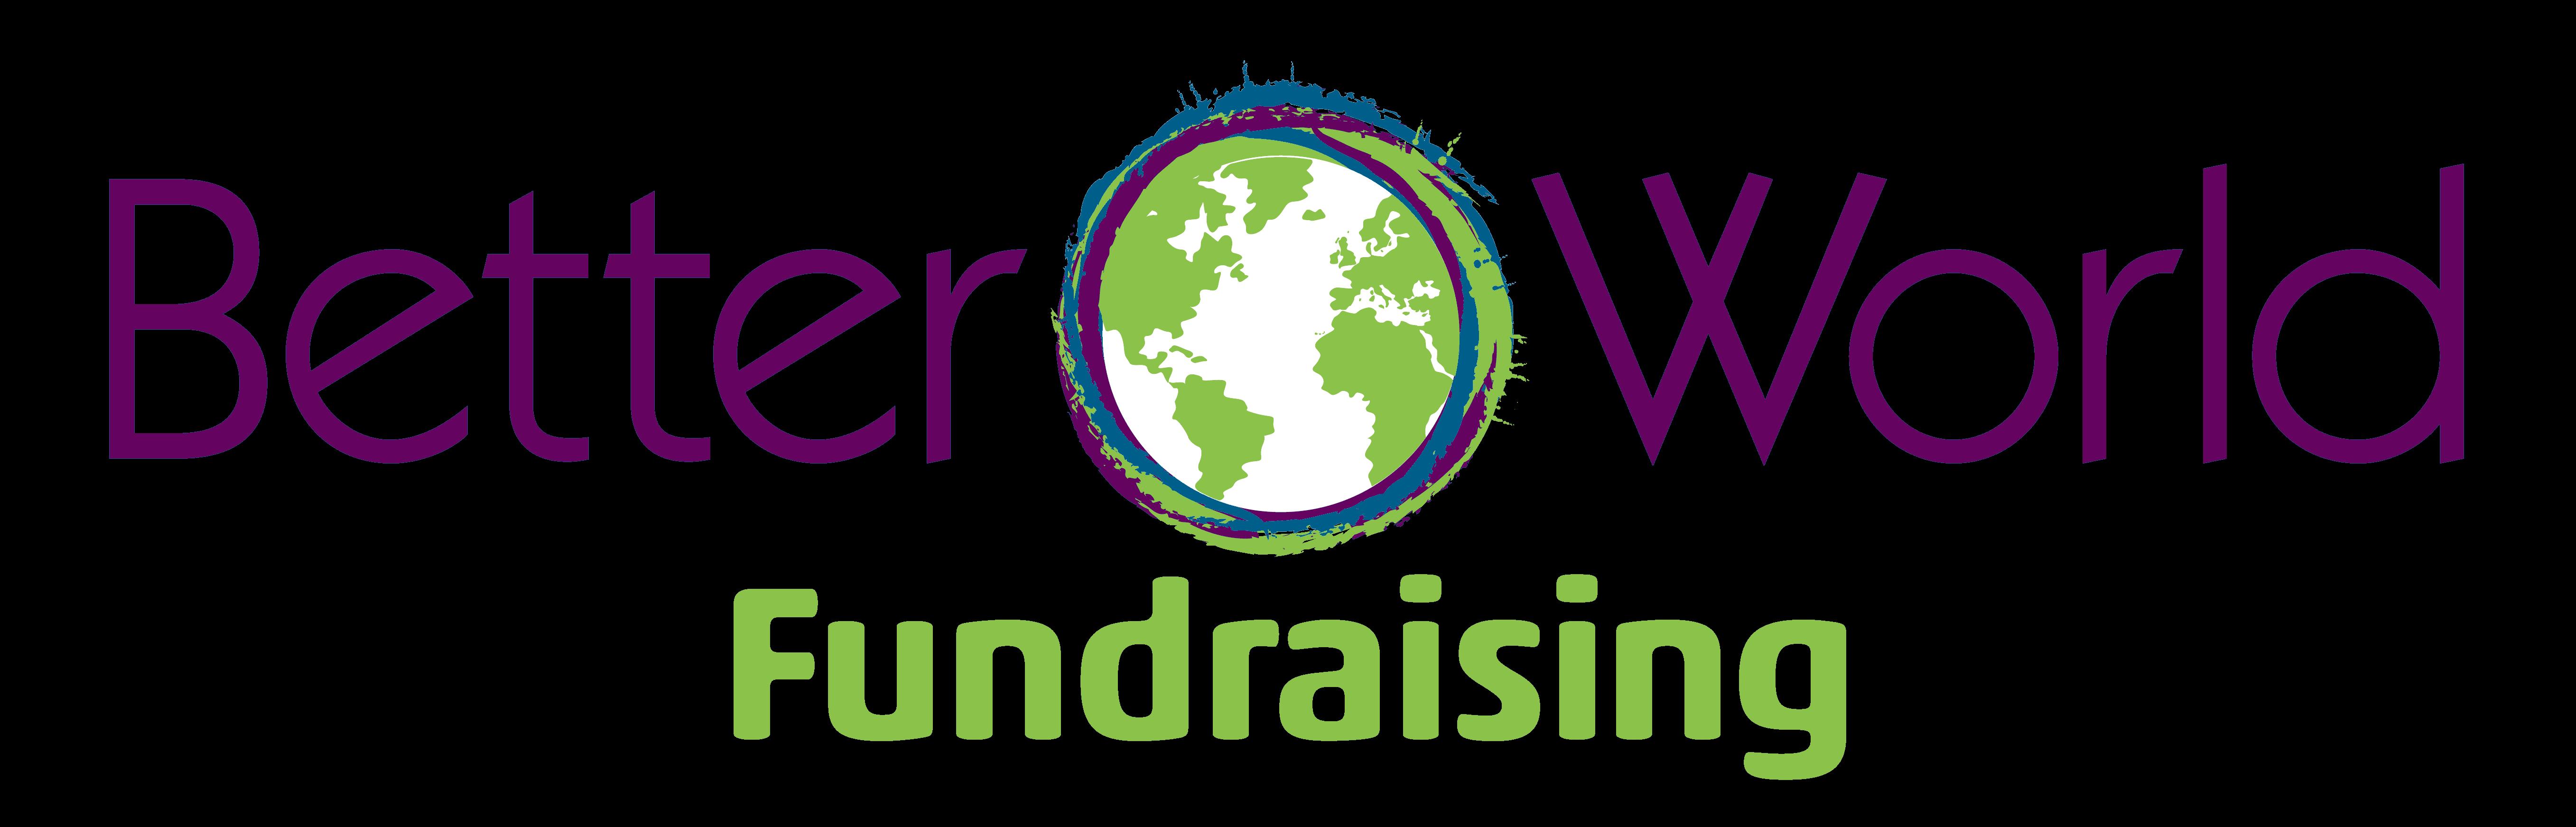 Better World Fundraising